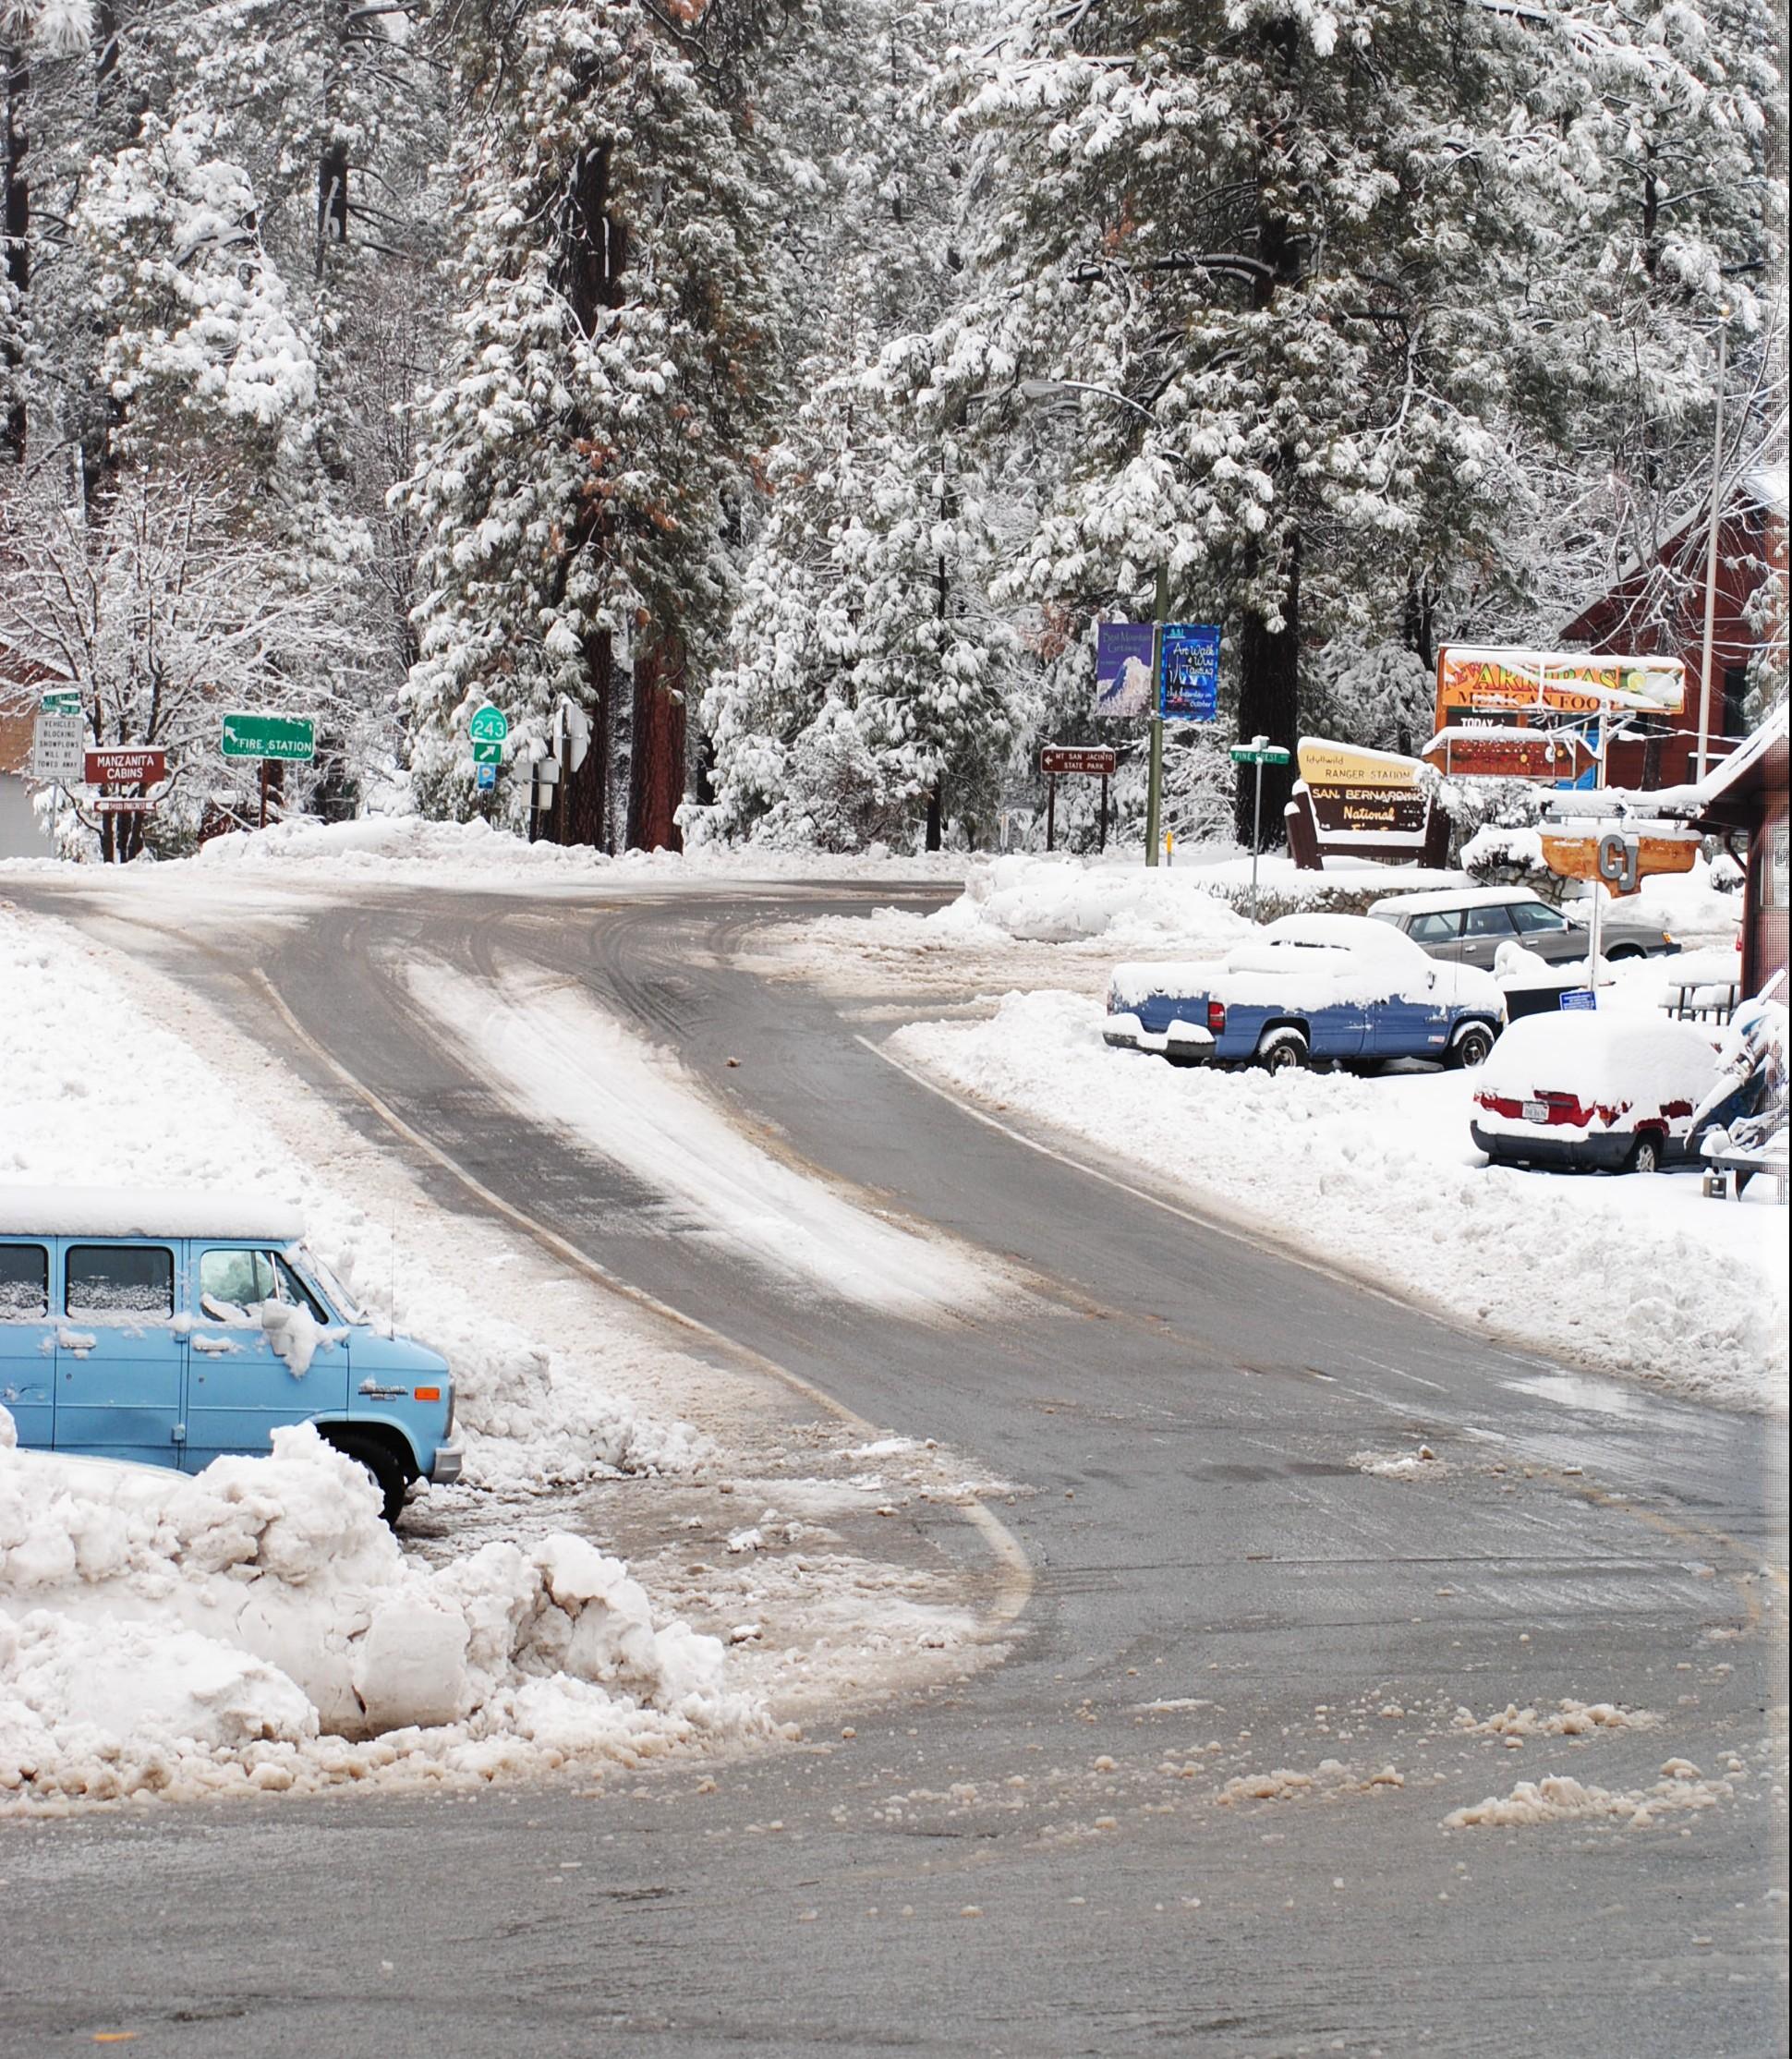 Snow arrived, plenty of it, Idyllwild still open ...